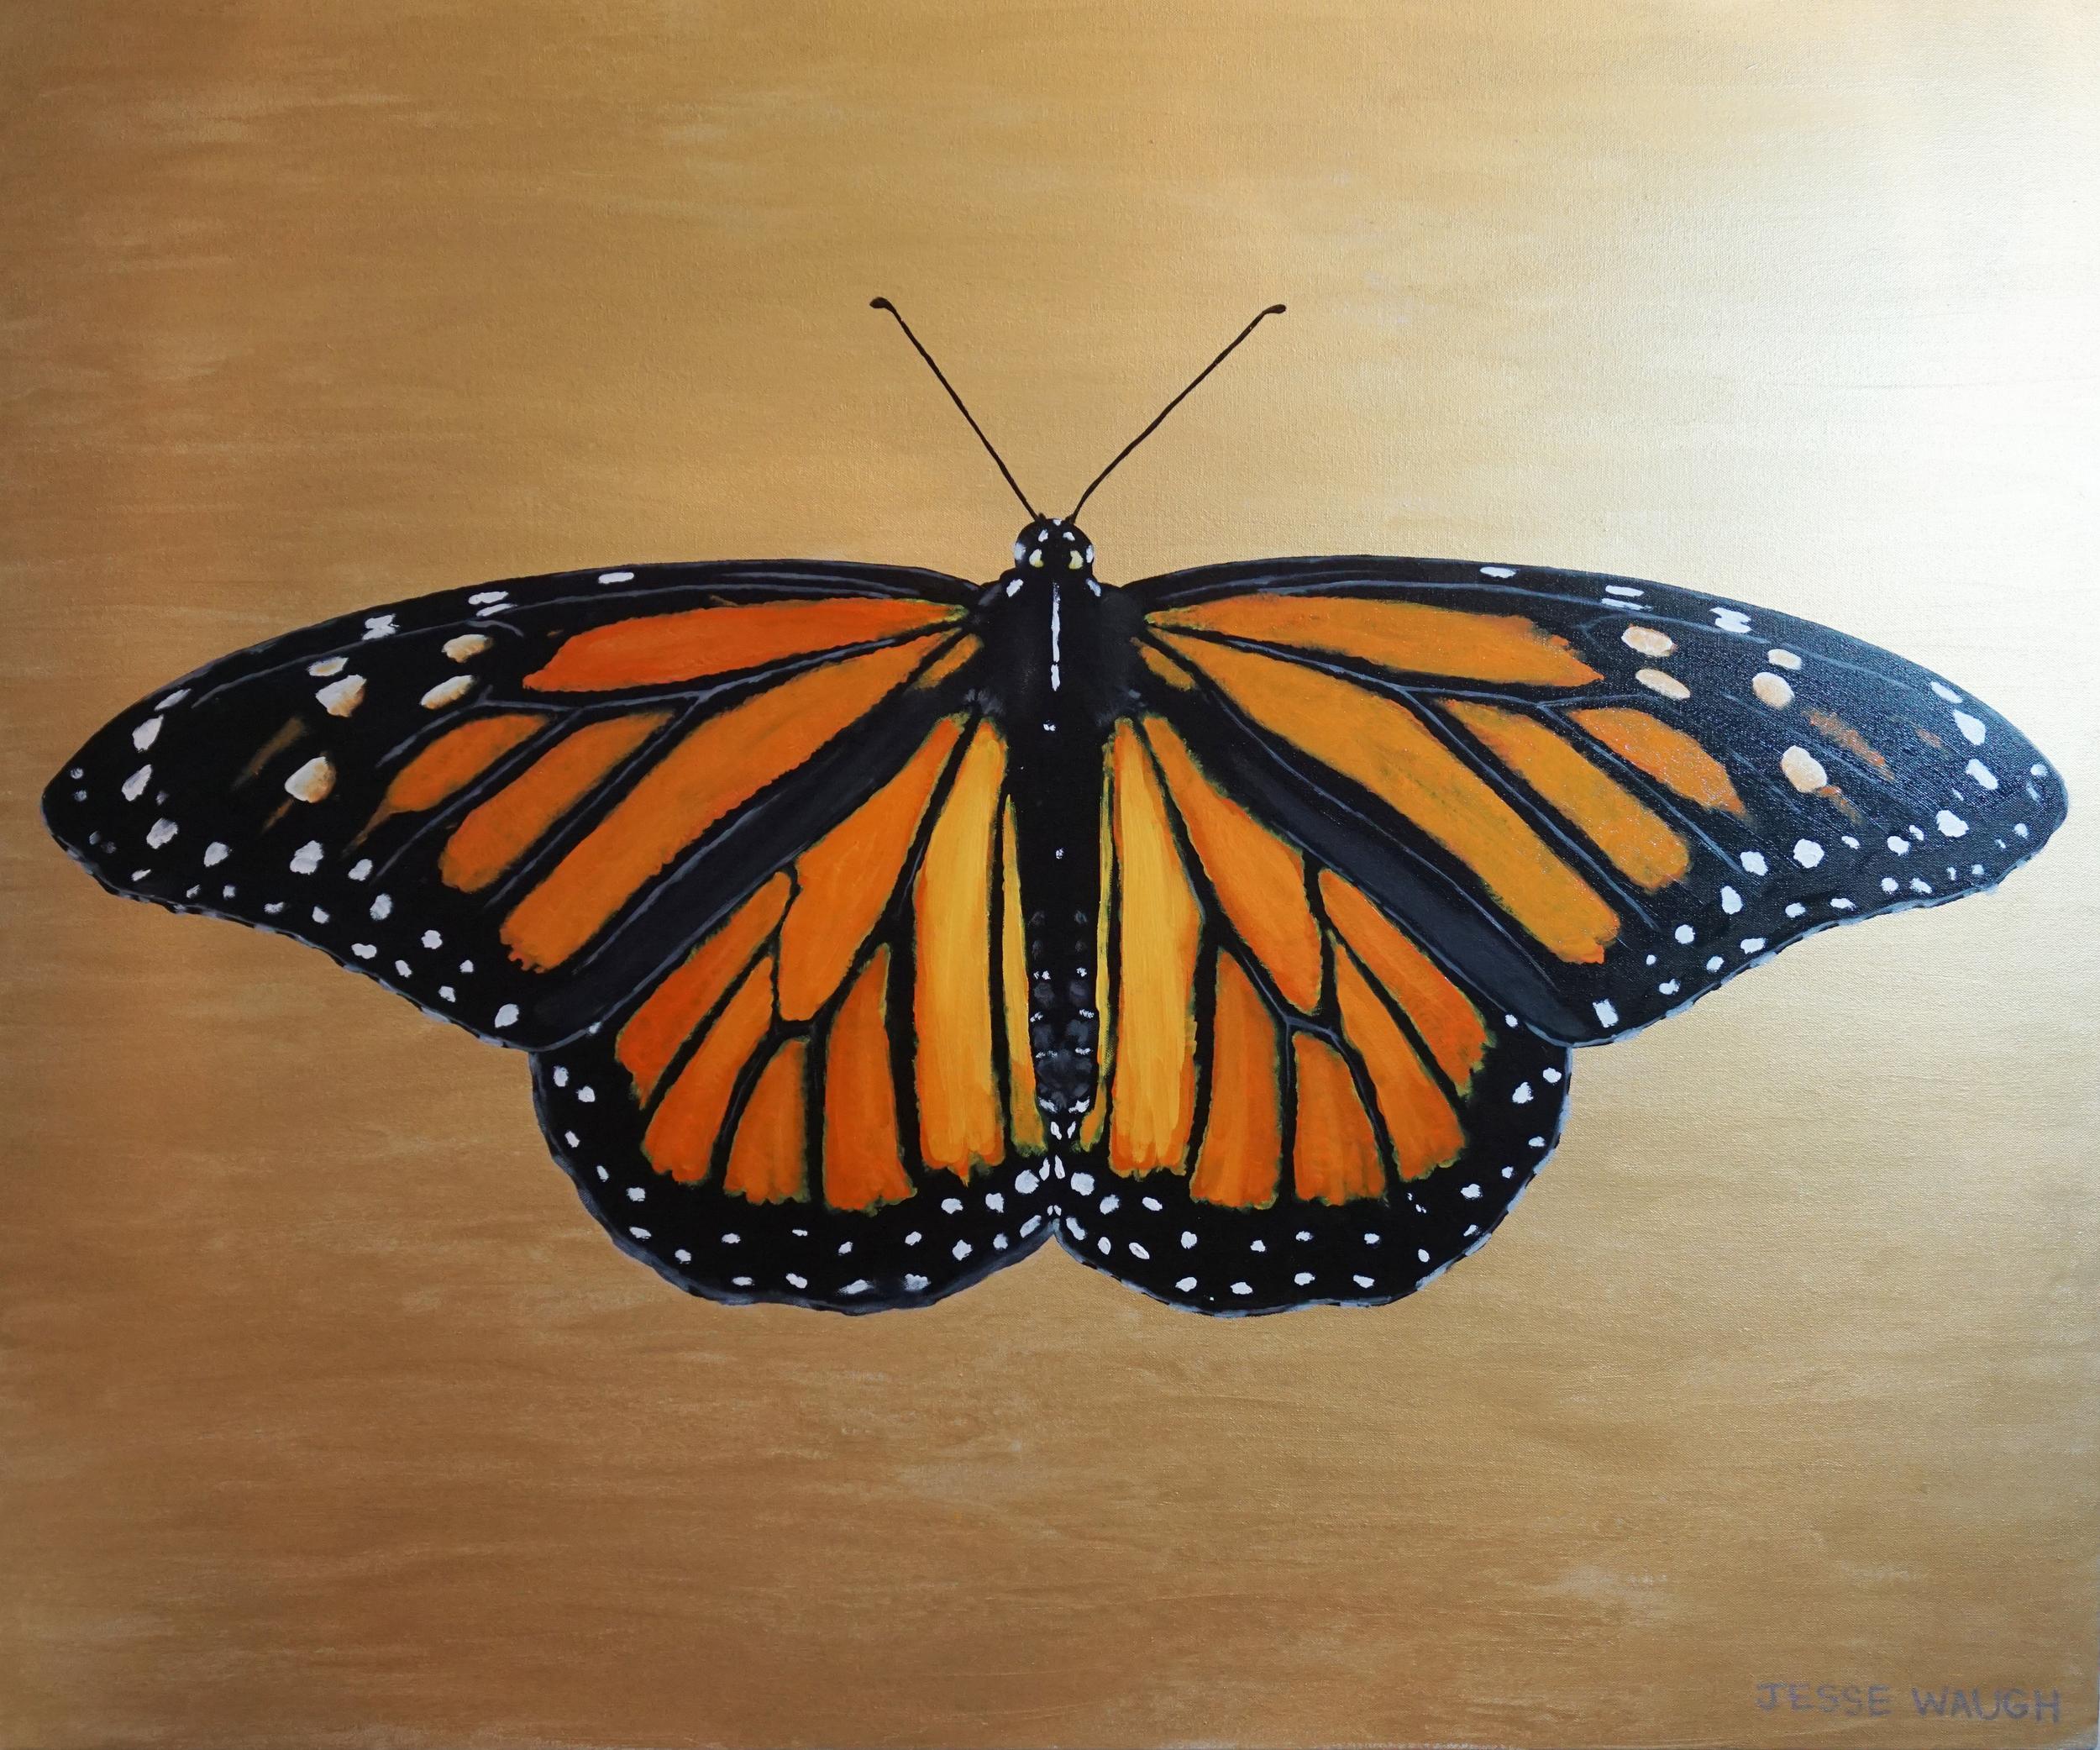 Jesse Waugh   Monarch  Danaus plexippus  Butterfly 3 2014 Oil on canvas